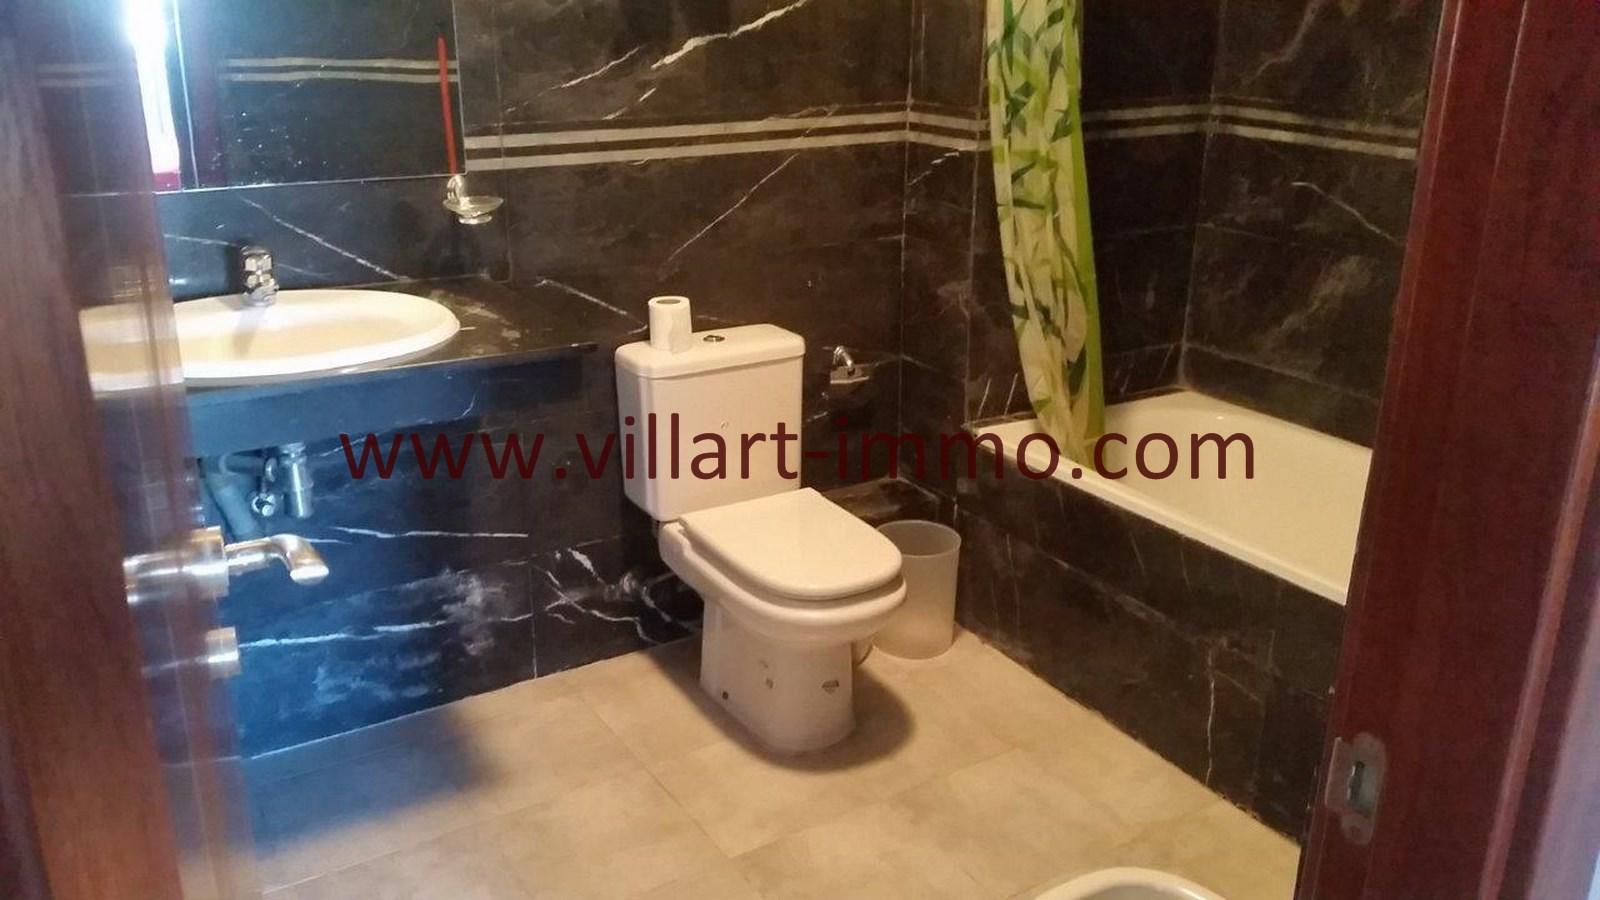 8-Vente-Appartement-Tanger-Centre-De-Ville-Salle de bain-VA576-Villart Immo